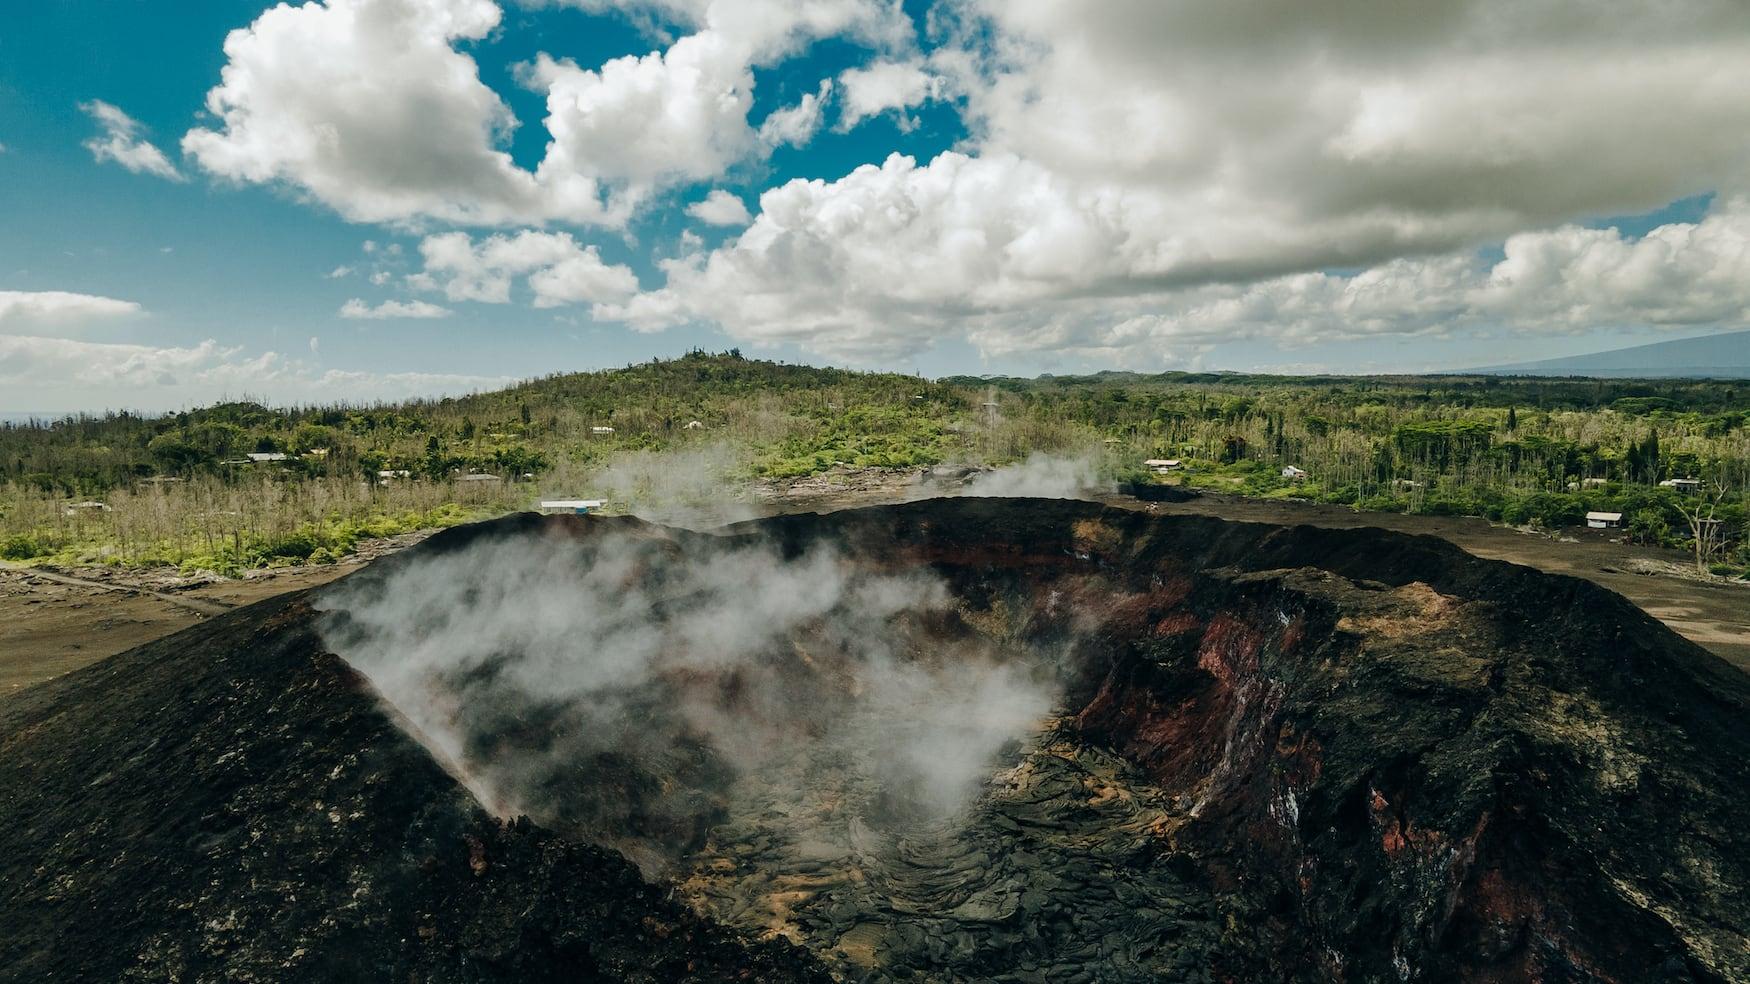 Gefrorene Lava vom Kilauea-Vulkan auf Big Island, Hawaii